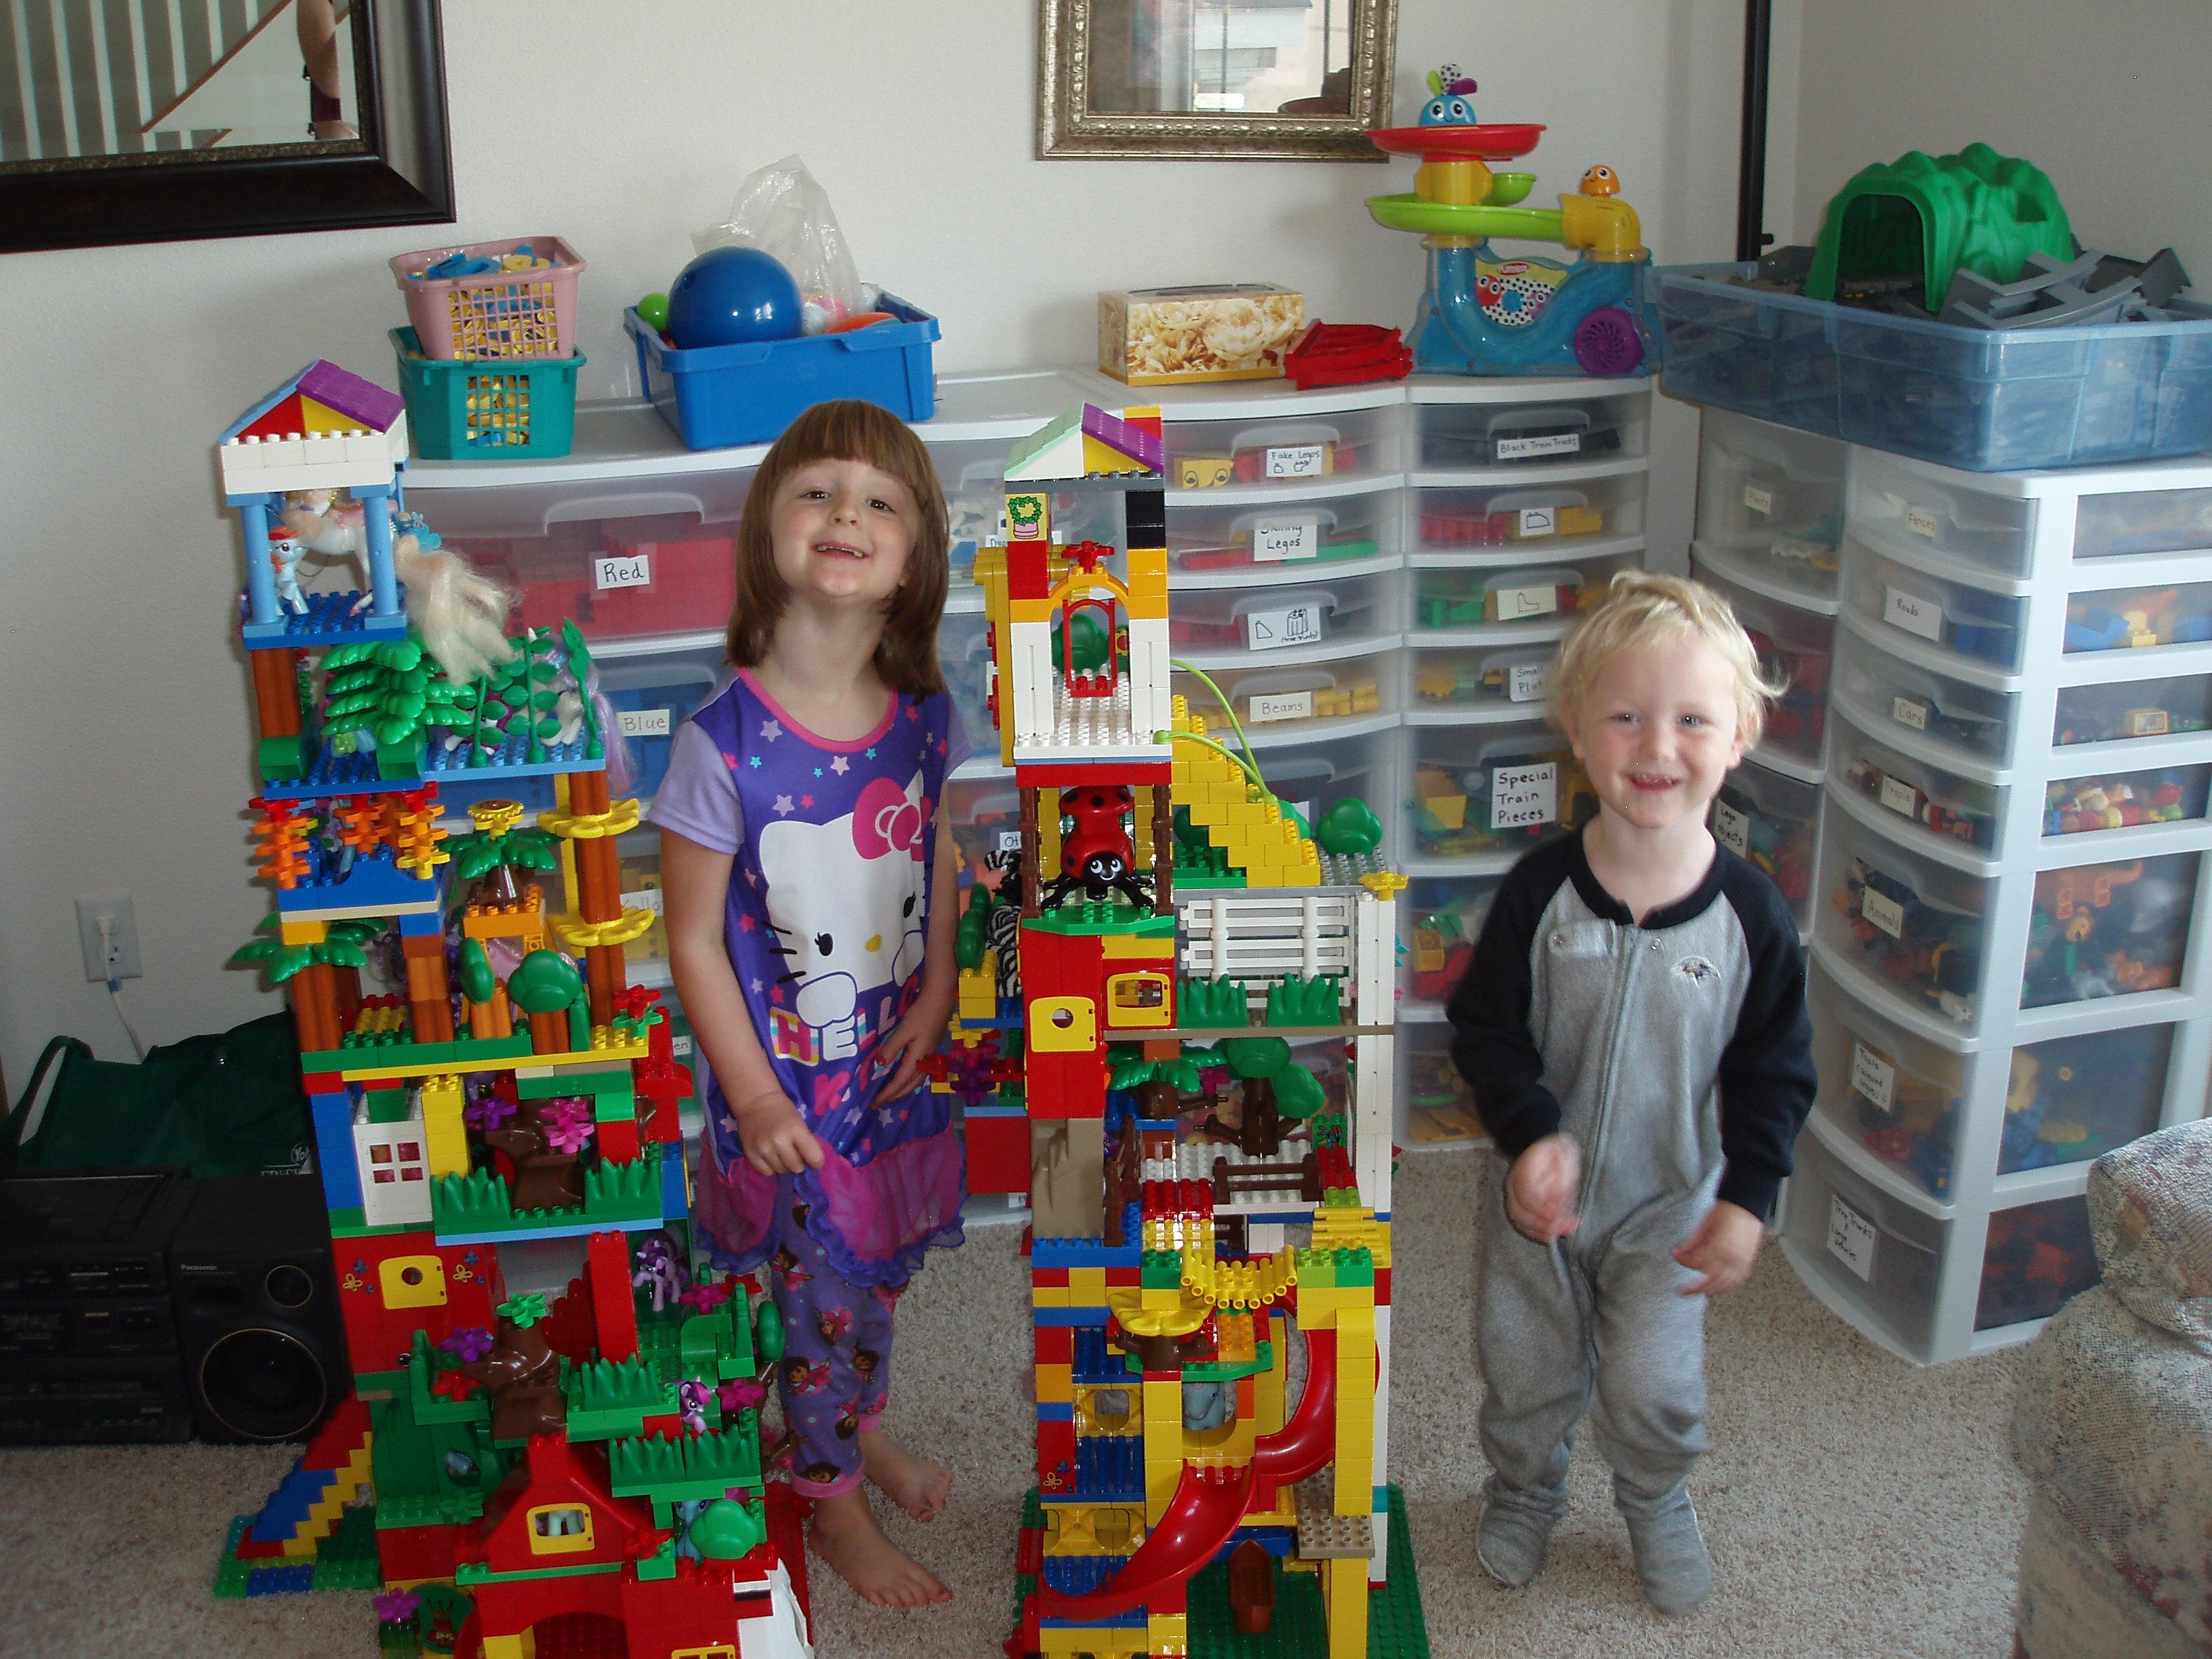 turnuri din lego